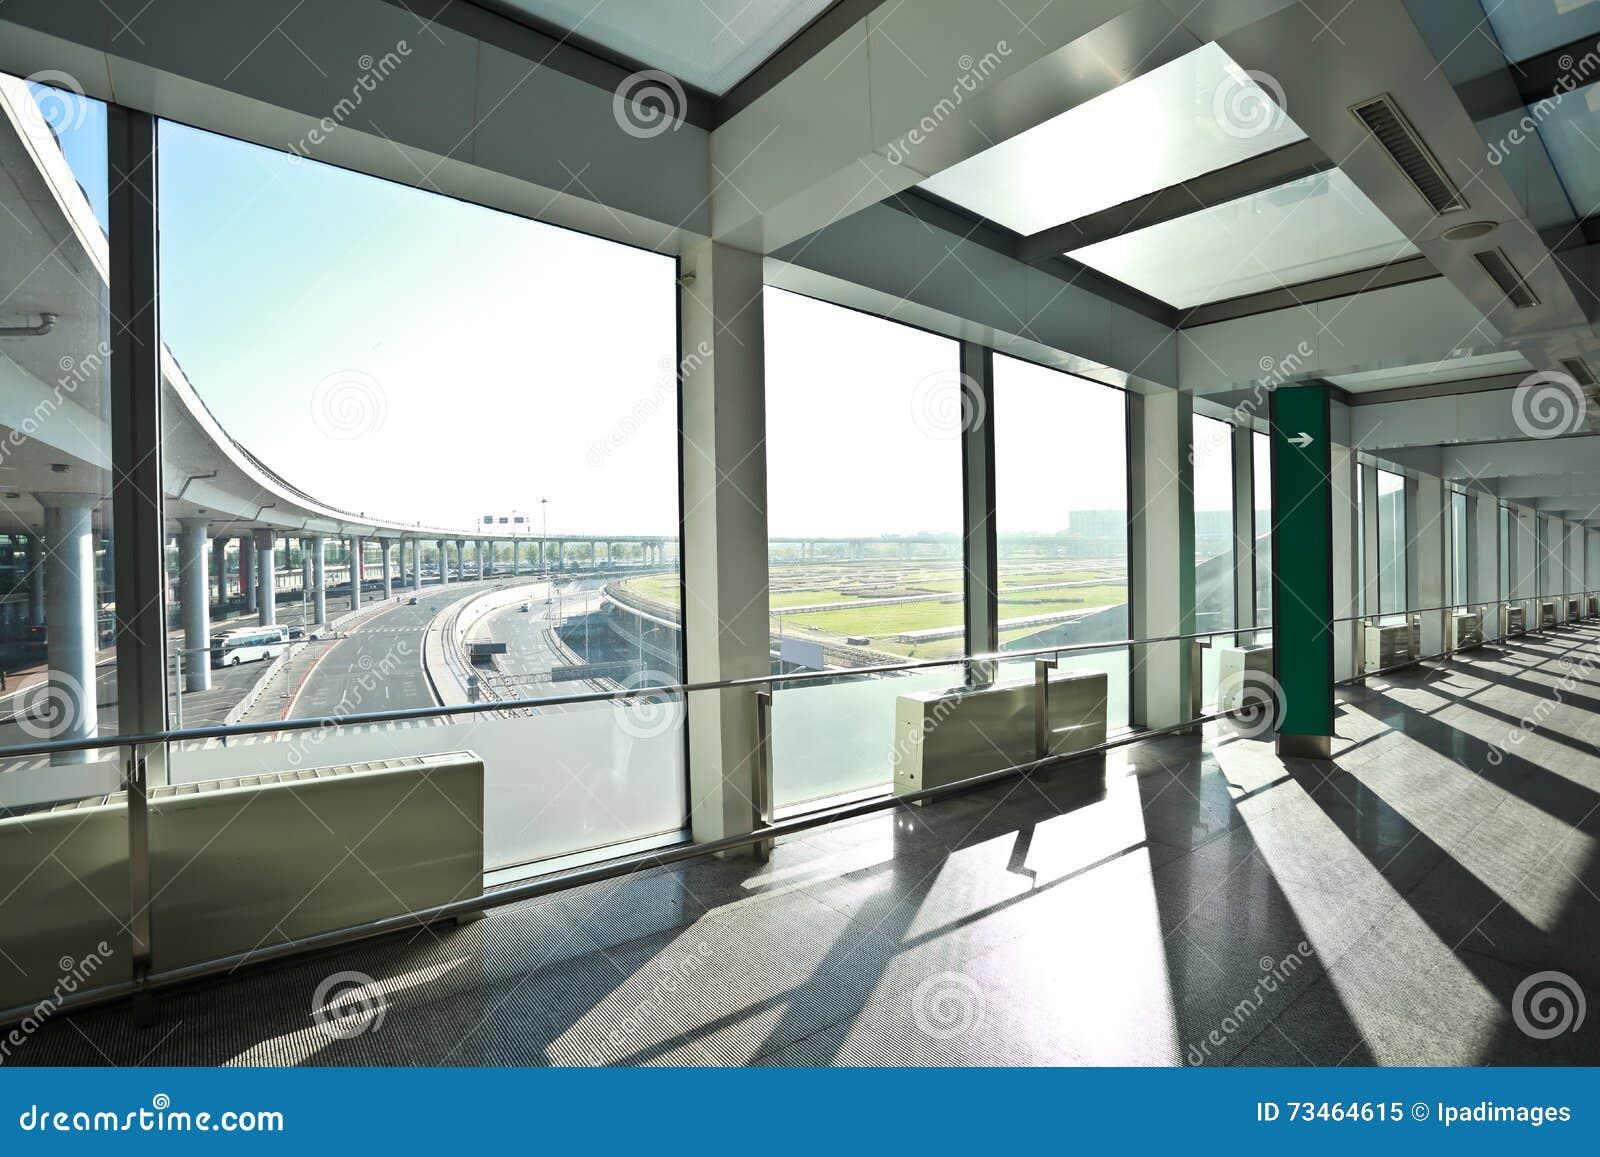 Sunny on modern glass office windows building interior for Modern office building interior